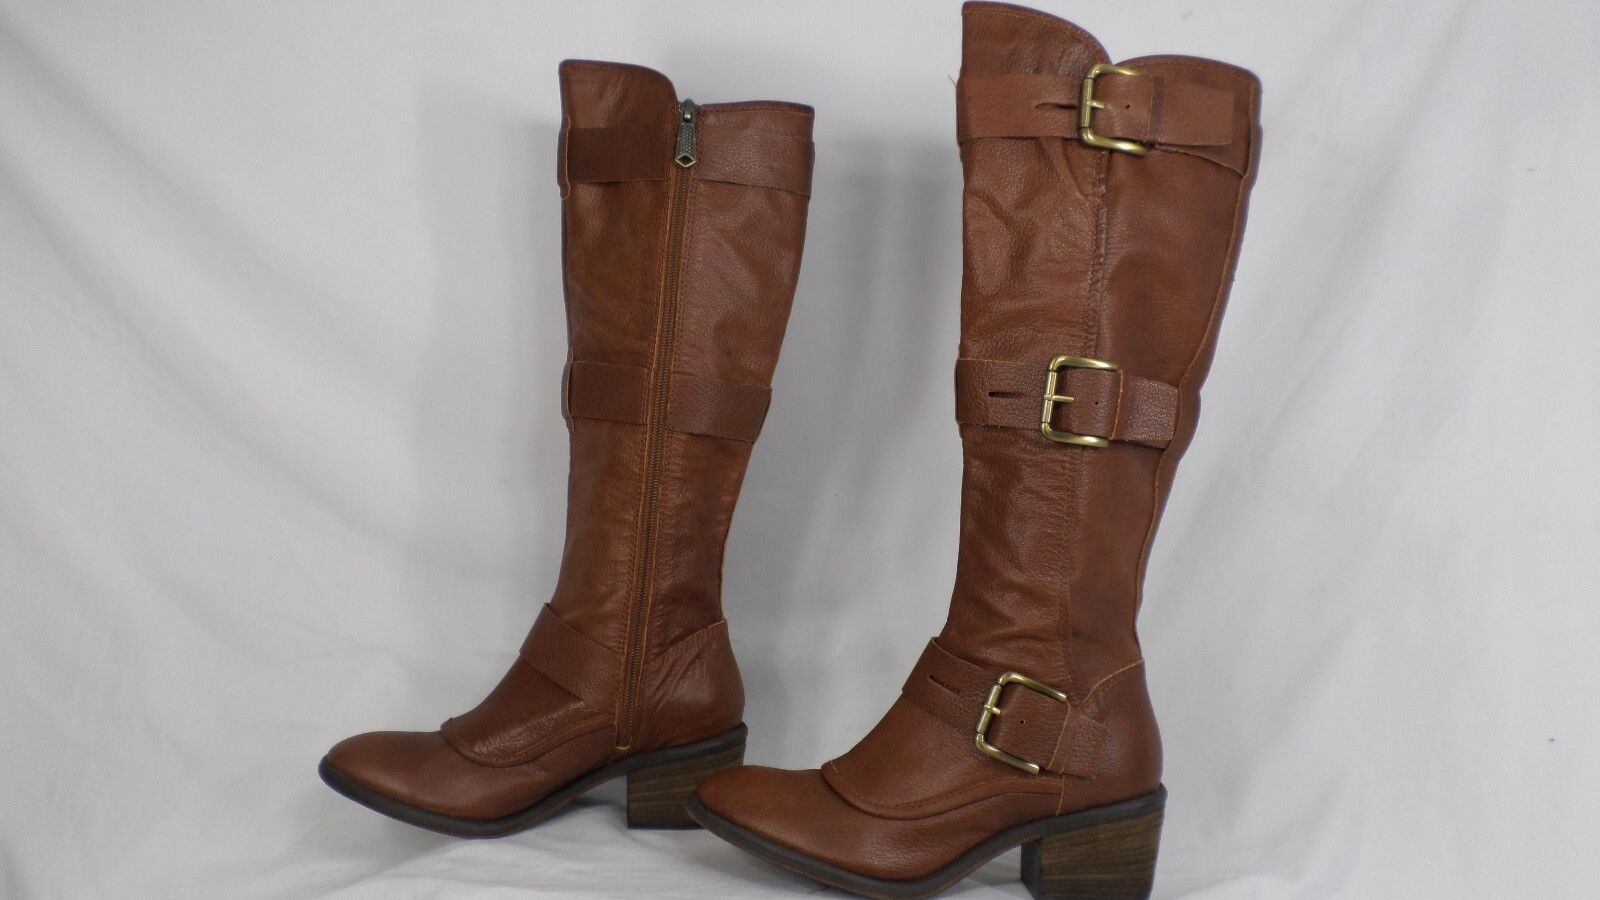 Donald J Pliner  Dax  Marroneee Leather Buckled Knee High avvio donna Dimensione 6 M